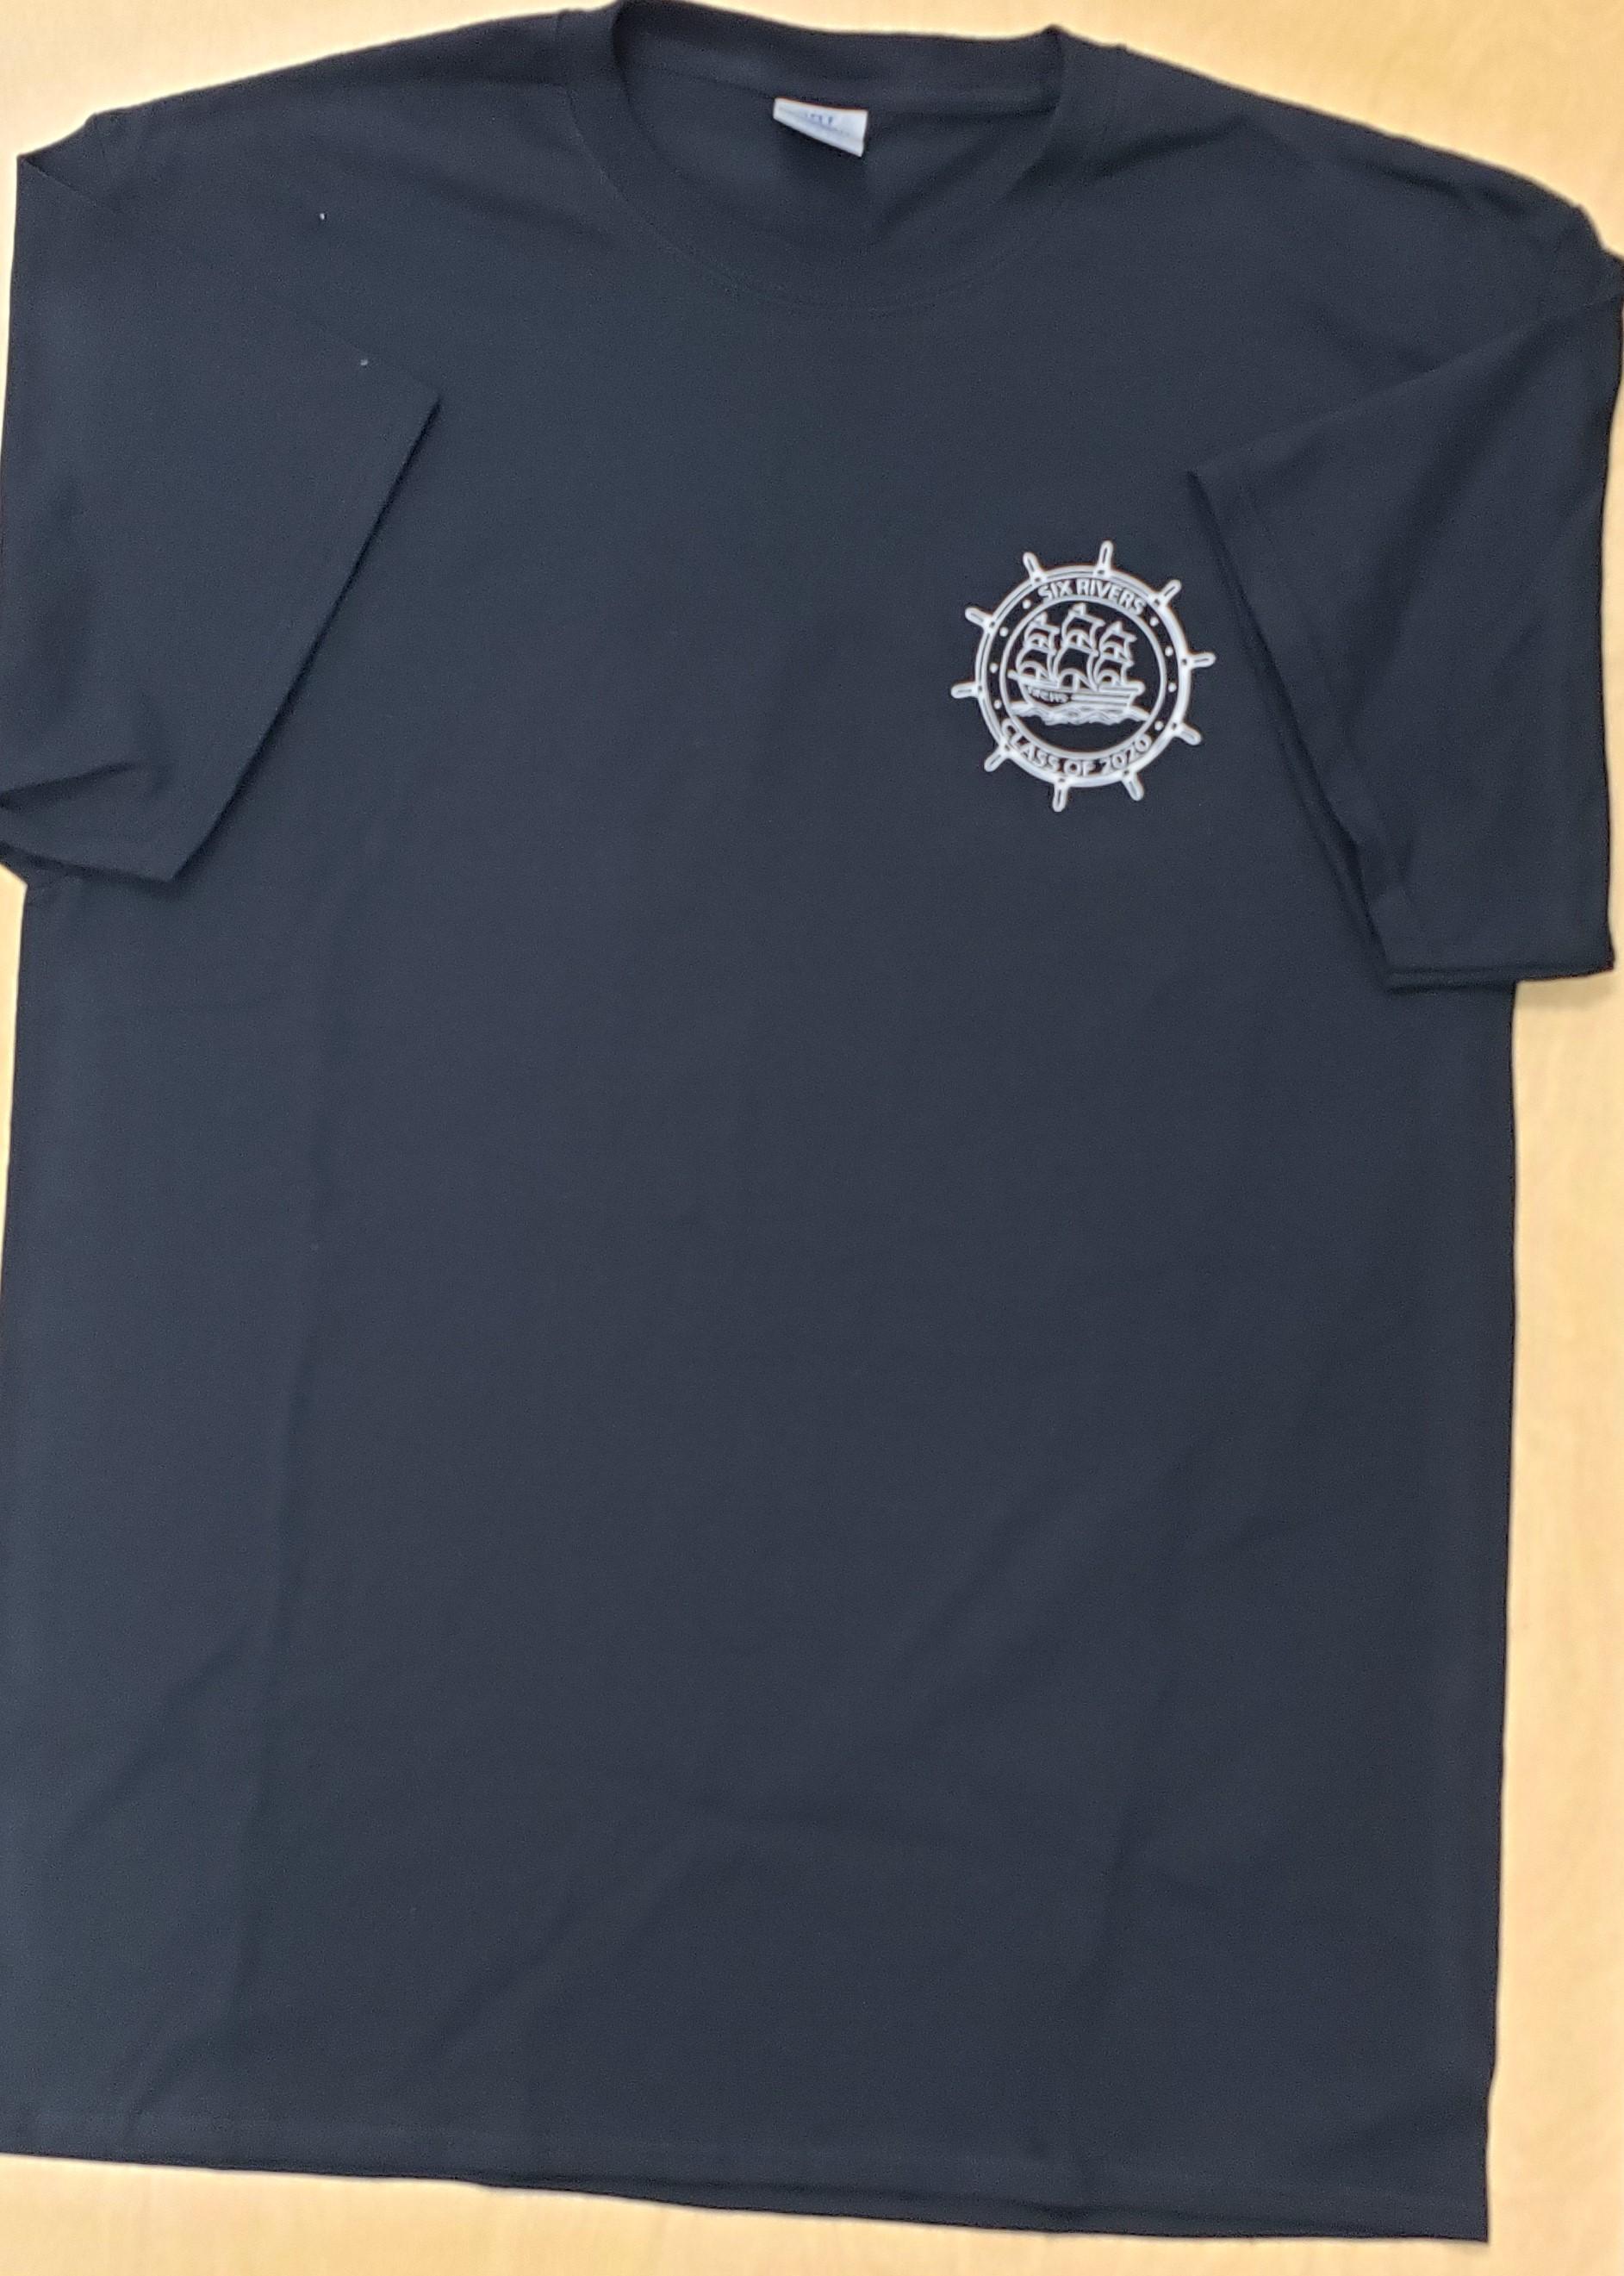 Black Shirt, White Print 'Class of 2020' - Men's Medium - Front Side